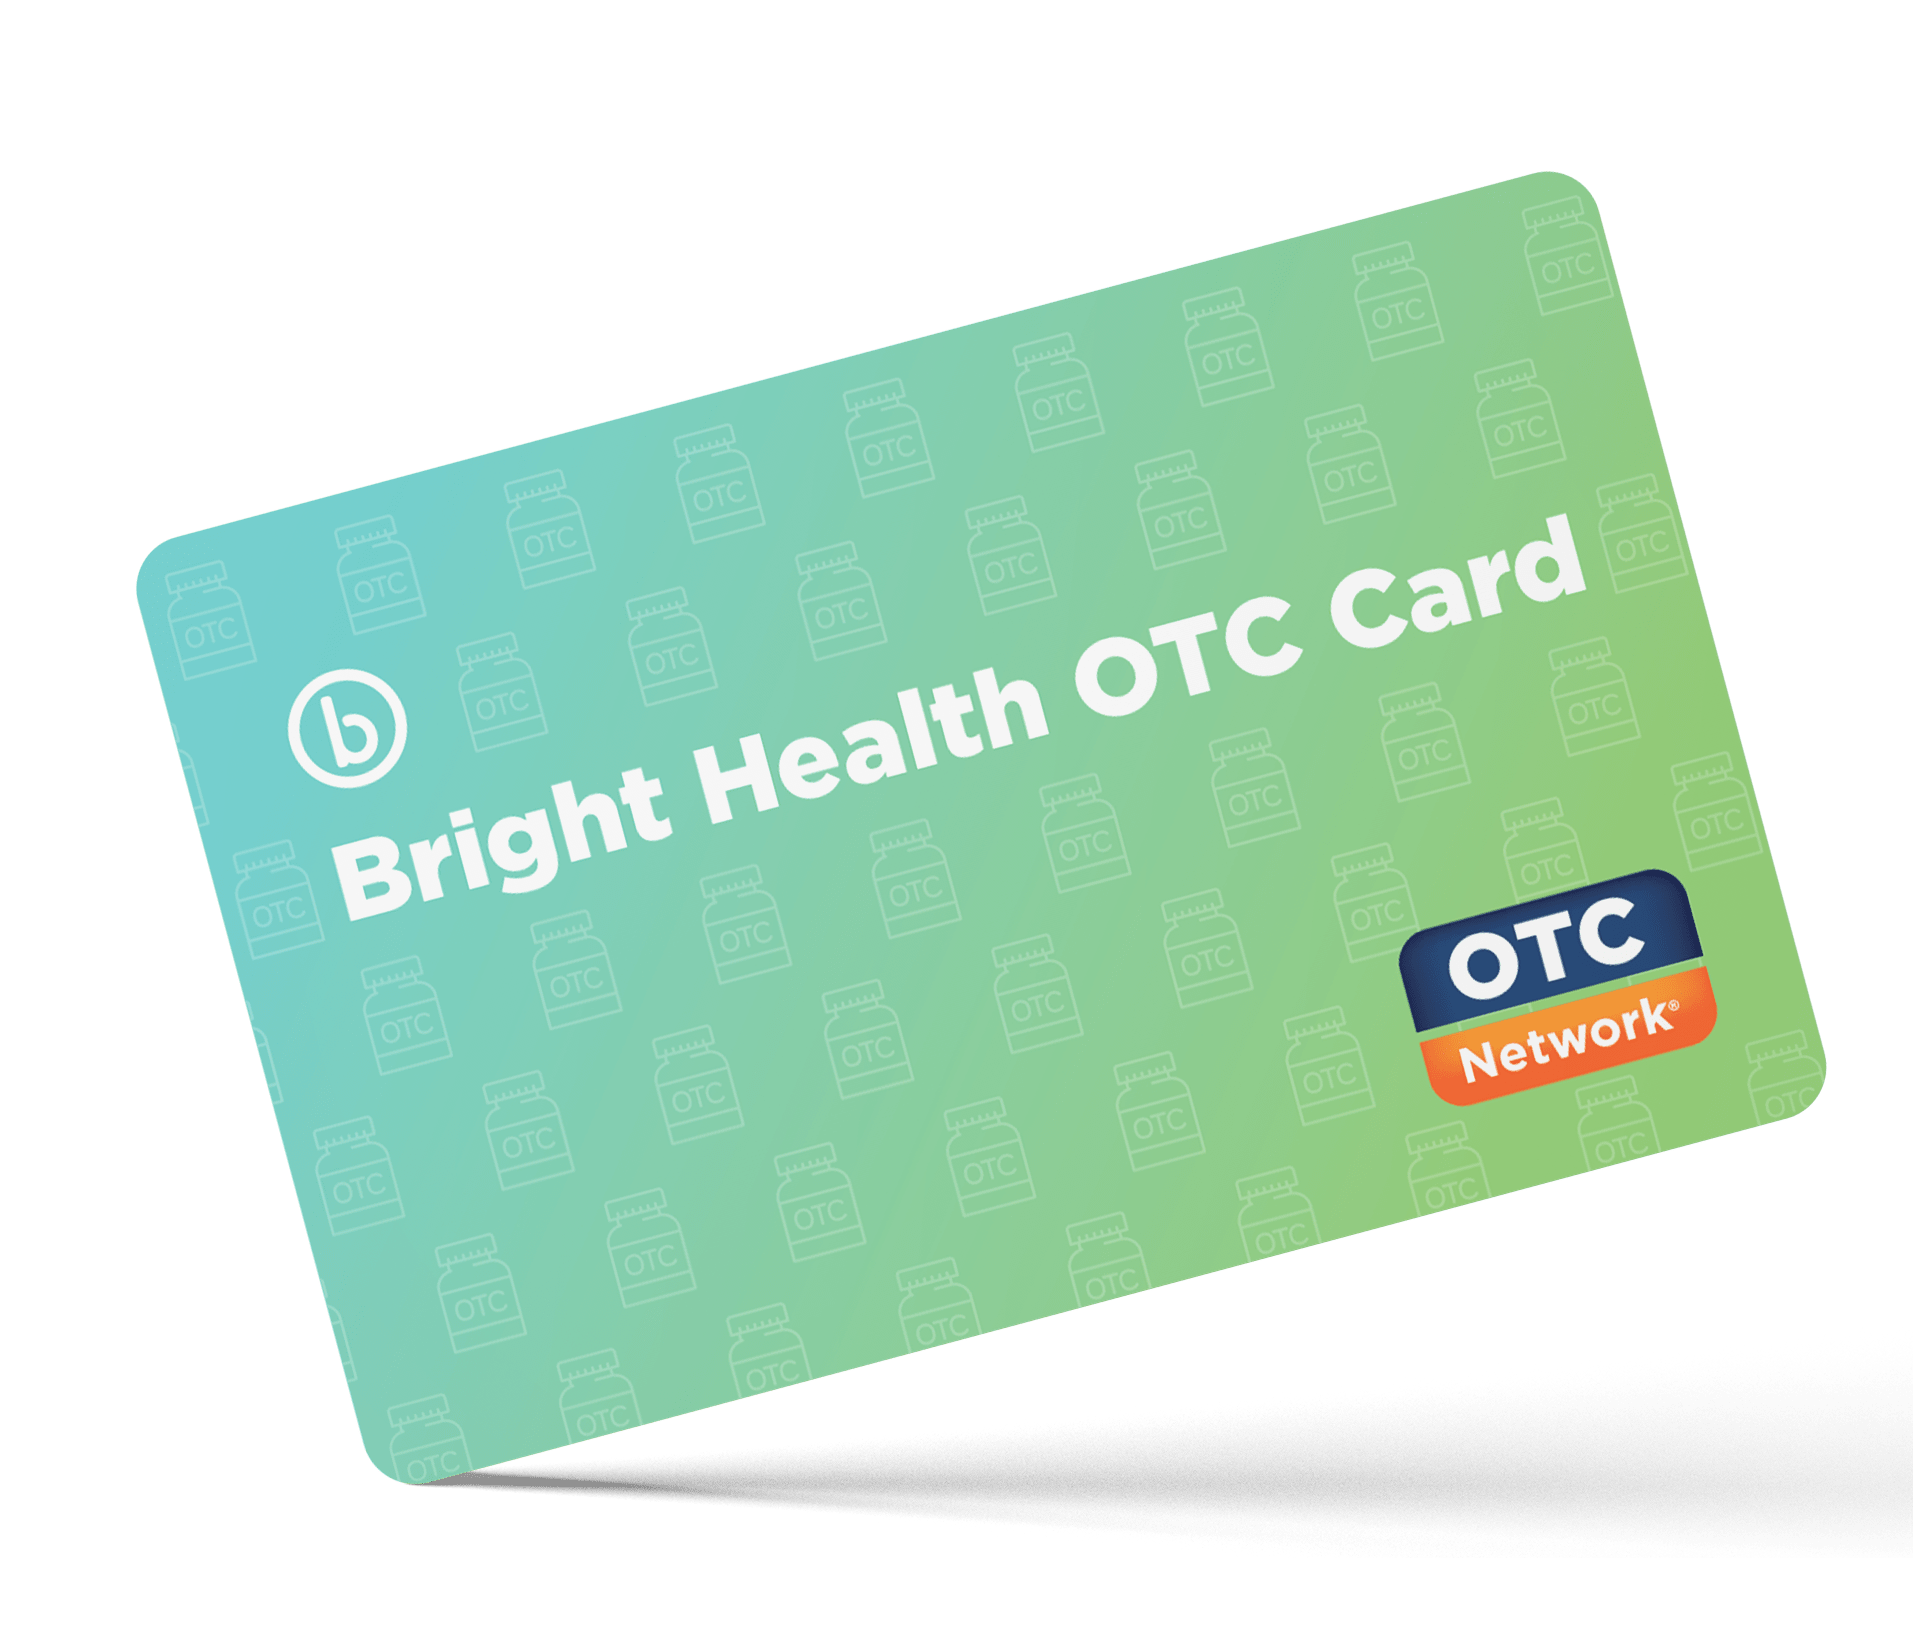 PNG de tarjeta OTC